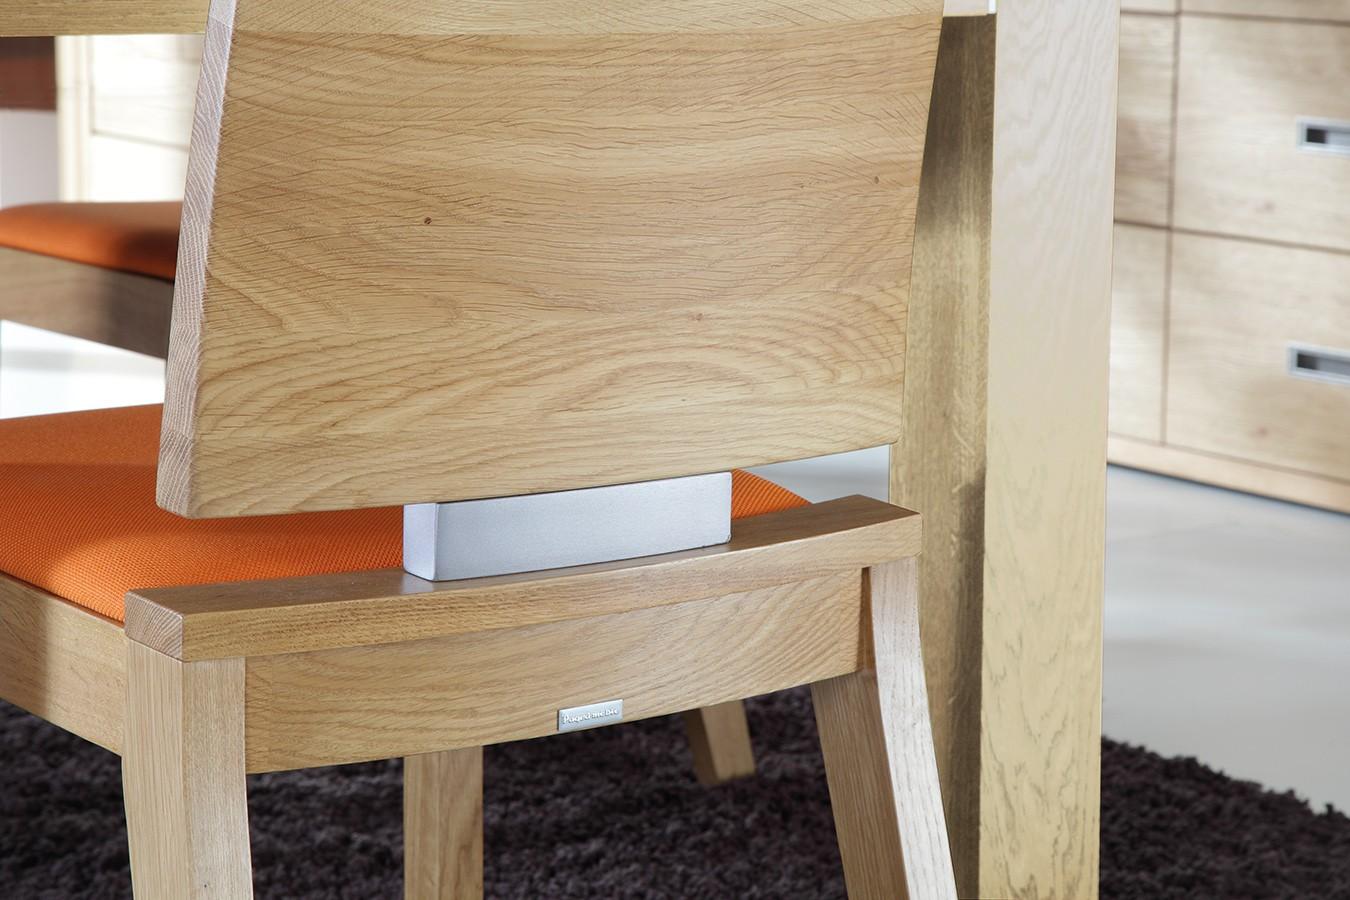 test3 Стул деревянный Natur (Paged, Польша)